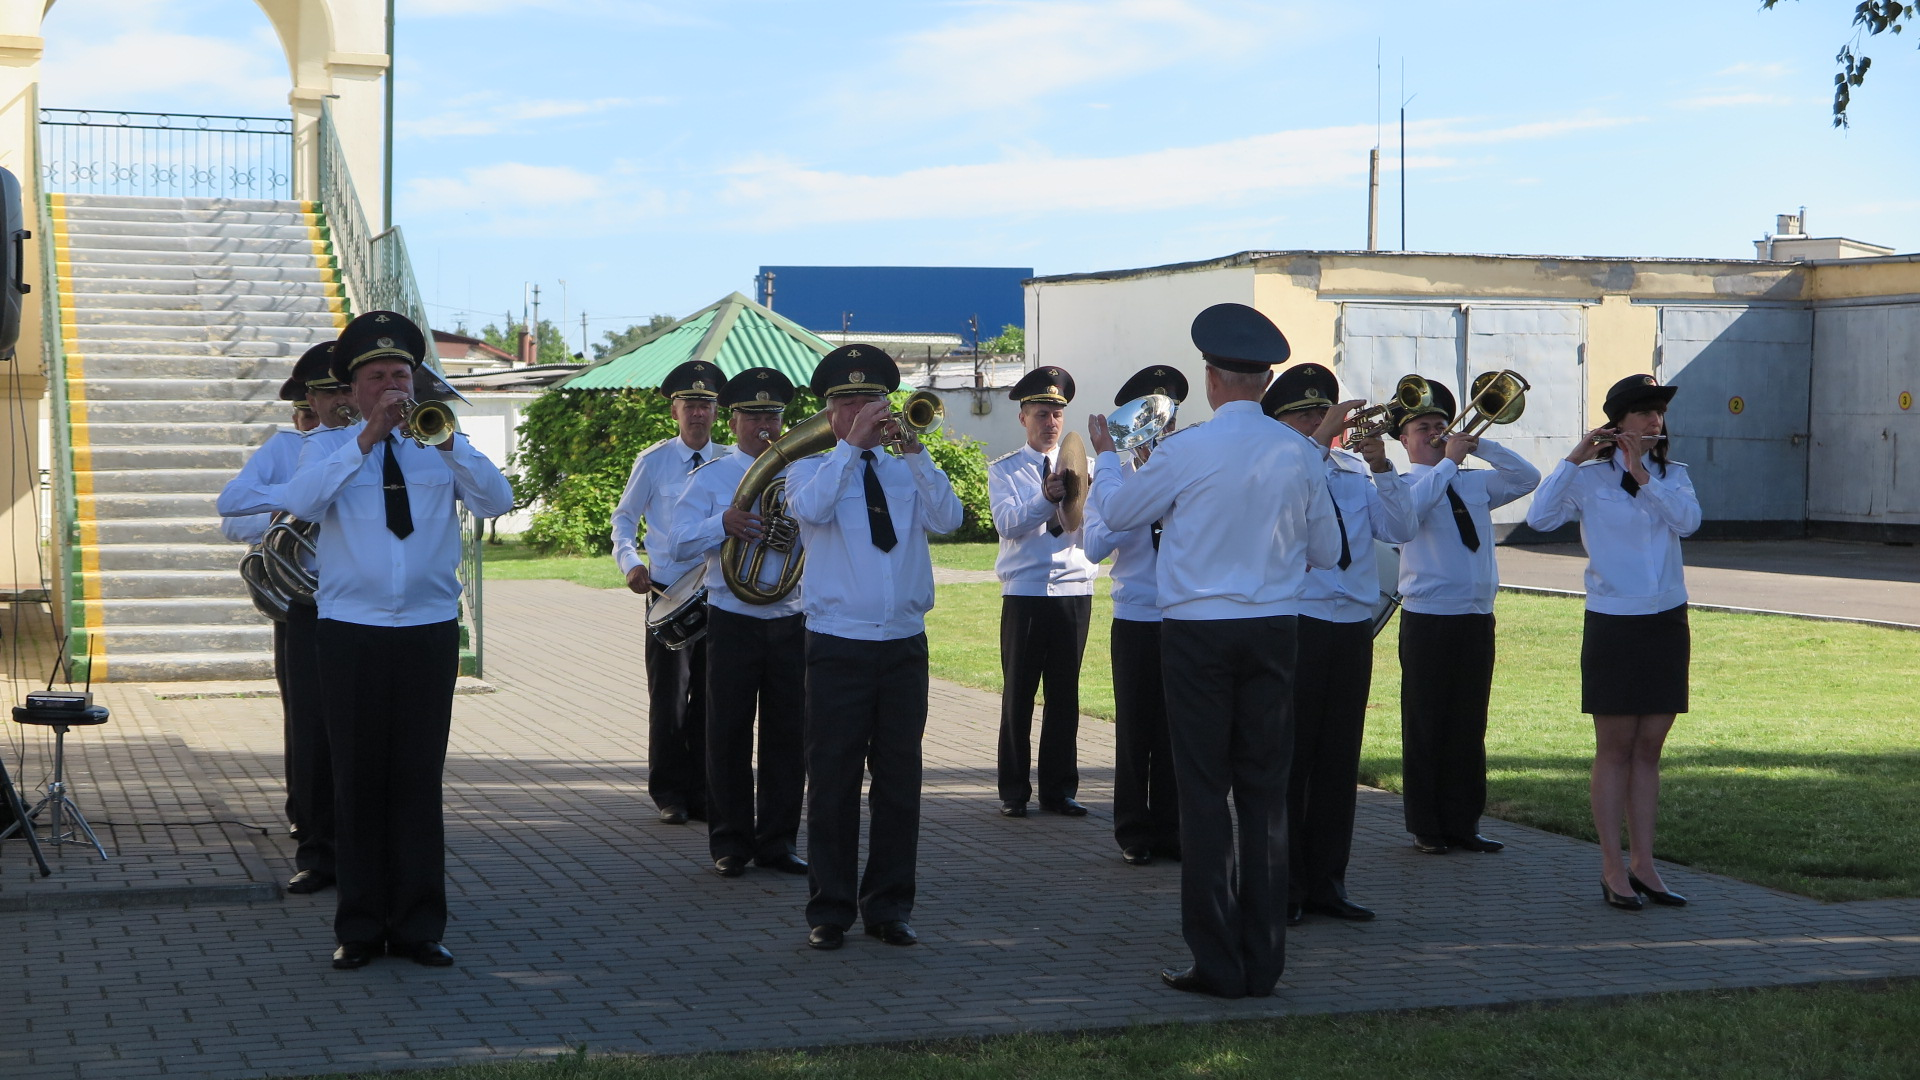 Оркестр военной части 7404 на присяге. Фото: Диана КОСЯКИНА